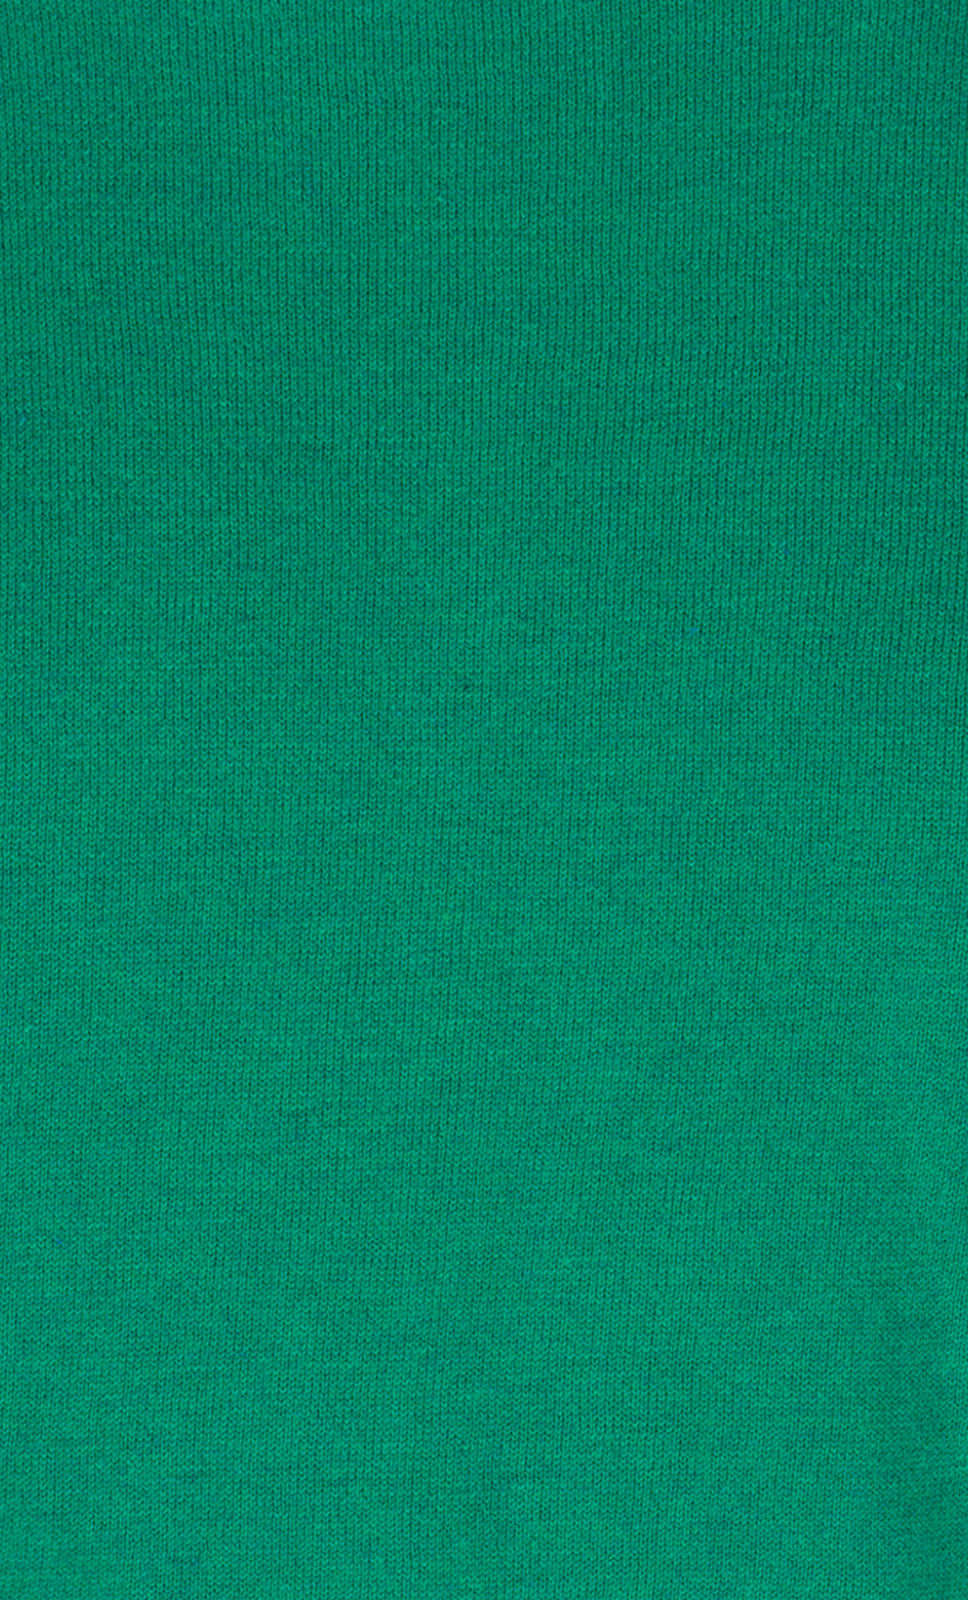 Cocoon-Meadow-Green